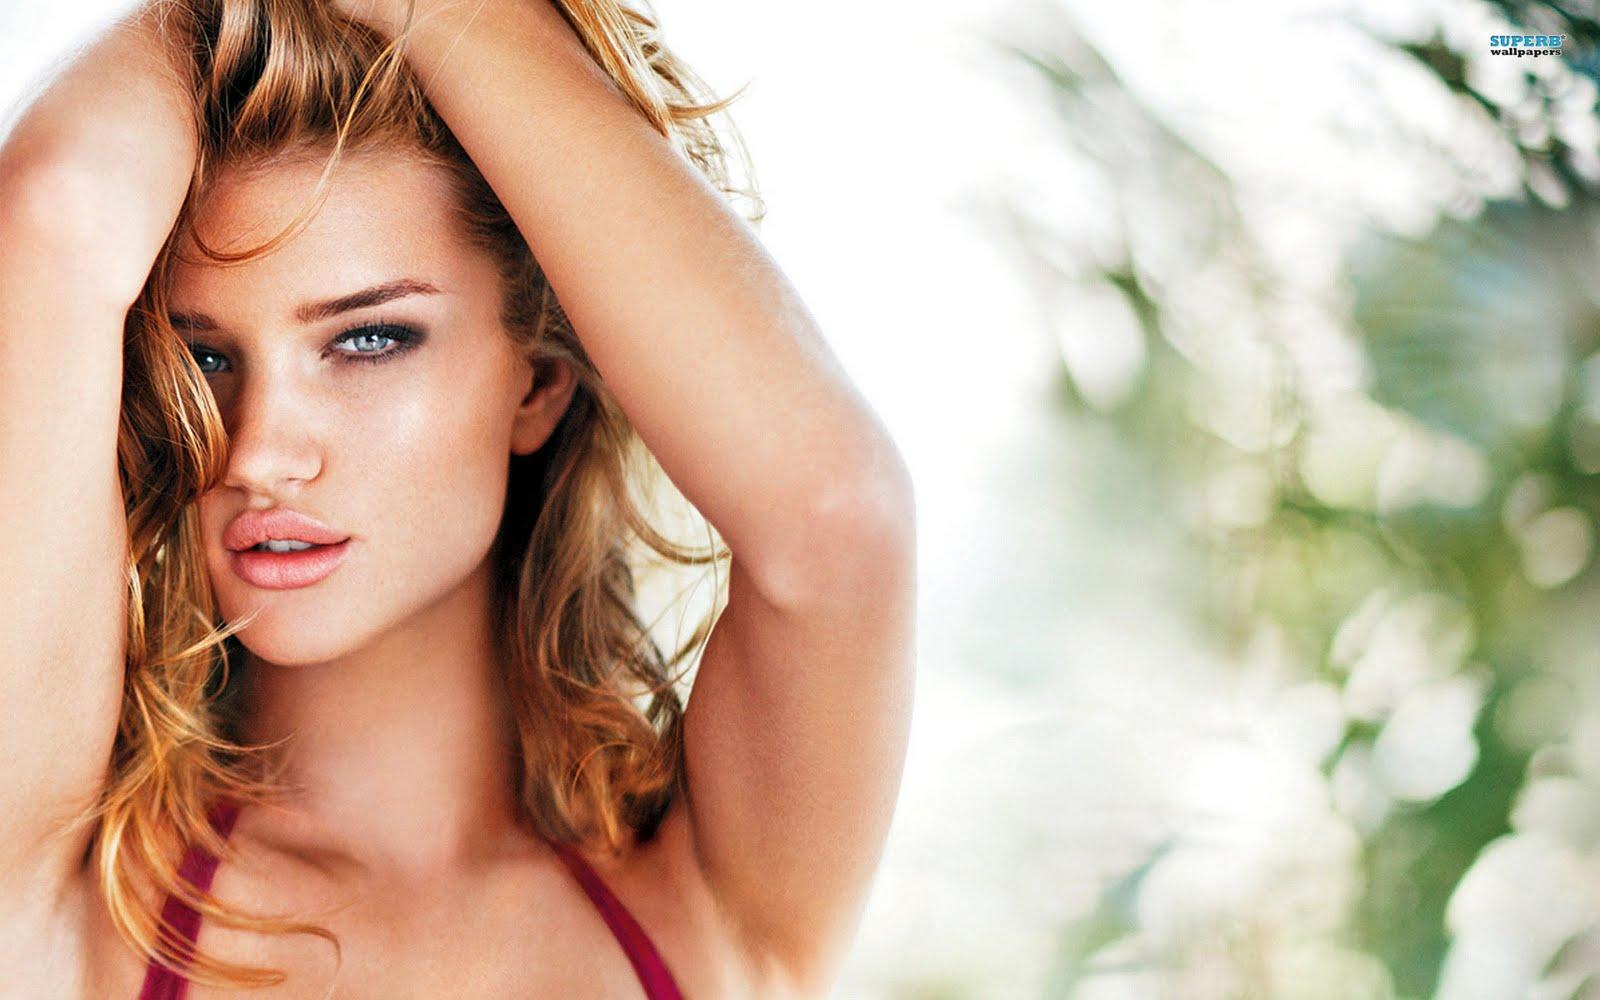 Desi girl sanjana nude pussy image